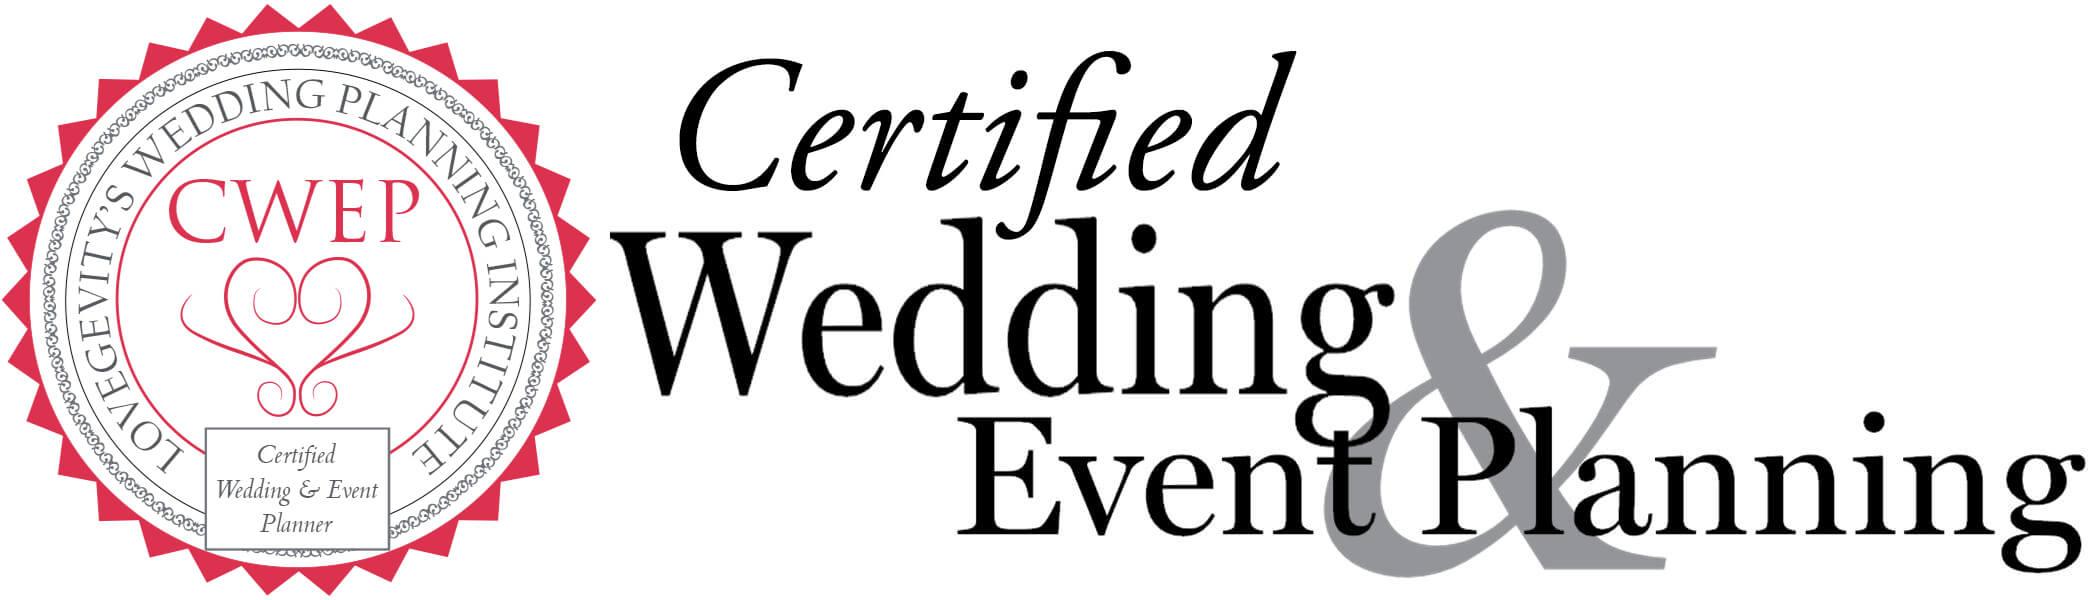 Libro de visitas certificacin organizacin de bodas y eventos certified wedding and event planning course tour 1betcityfo Images